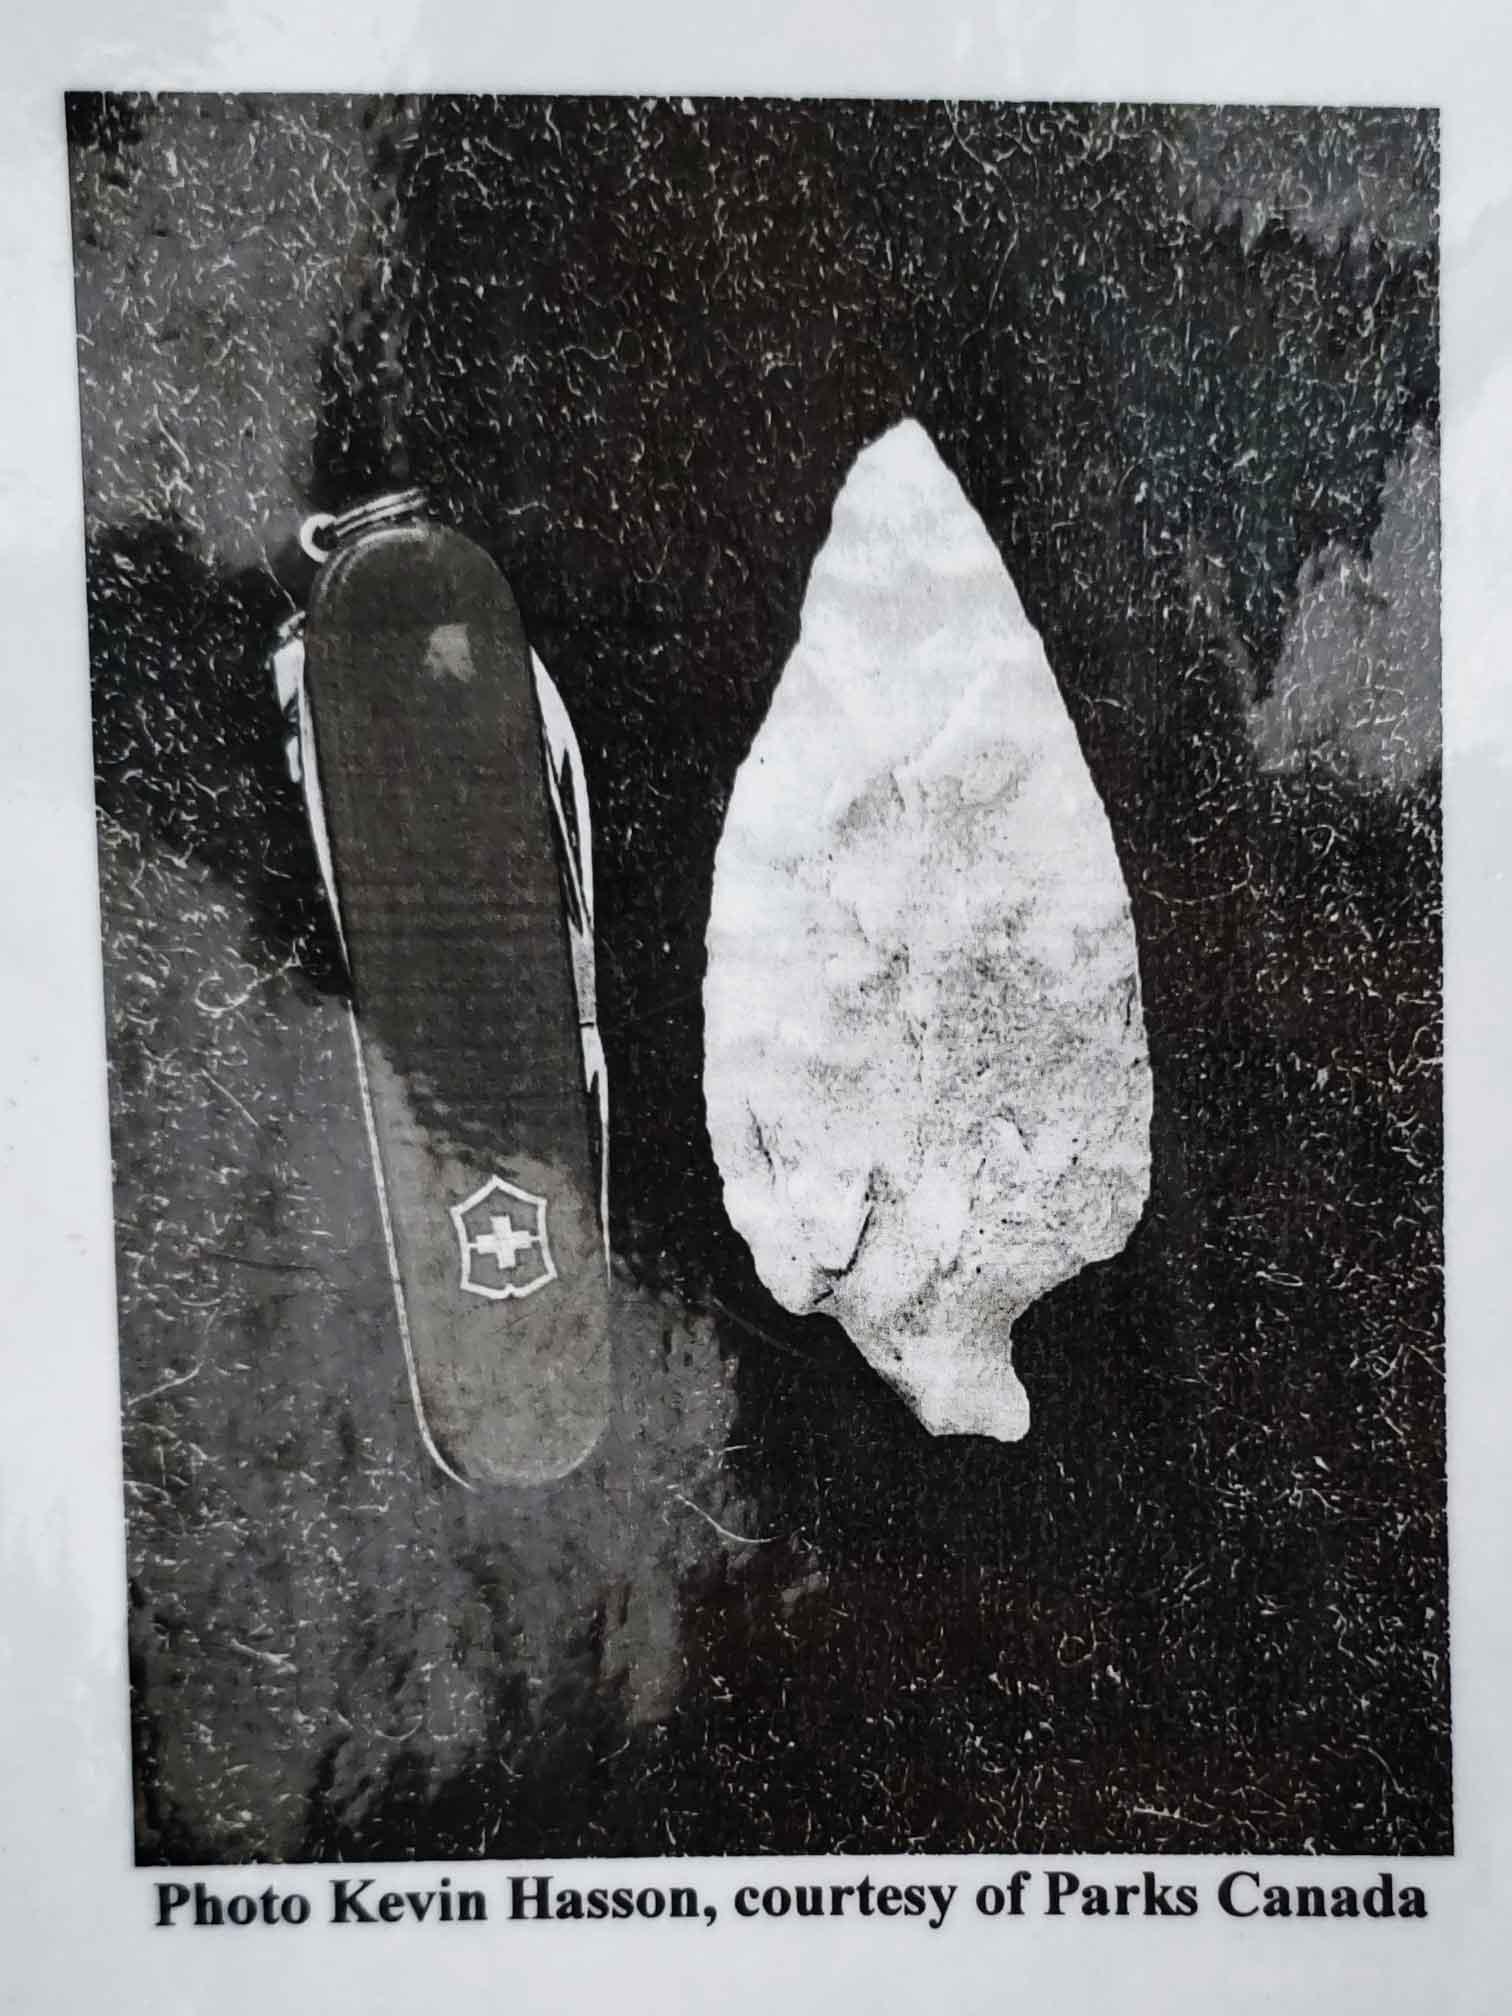 Arrowhead found in Jasper